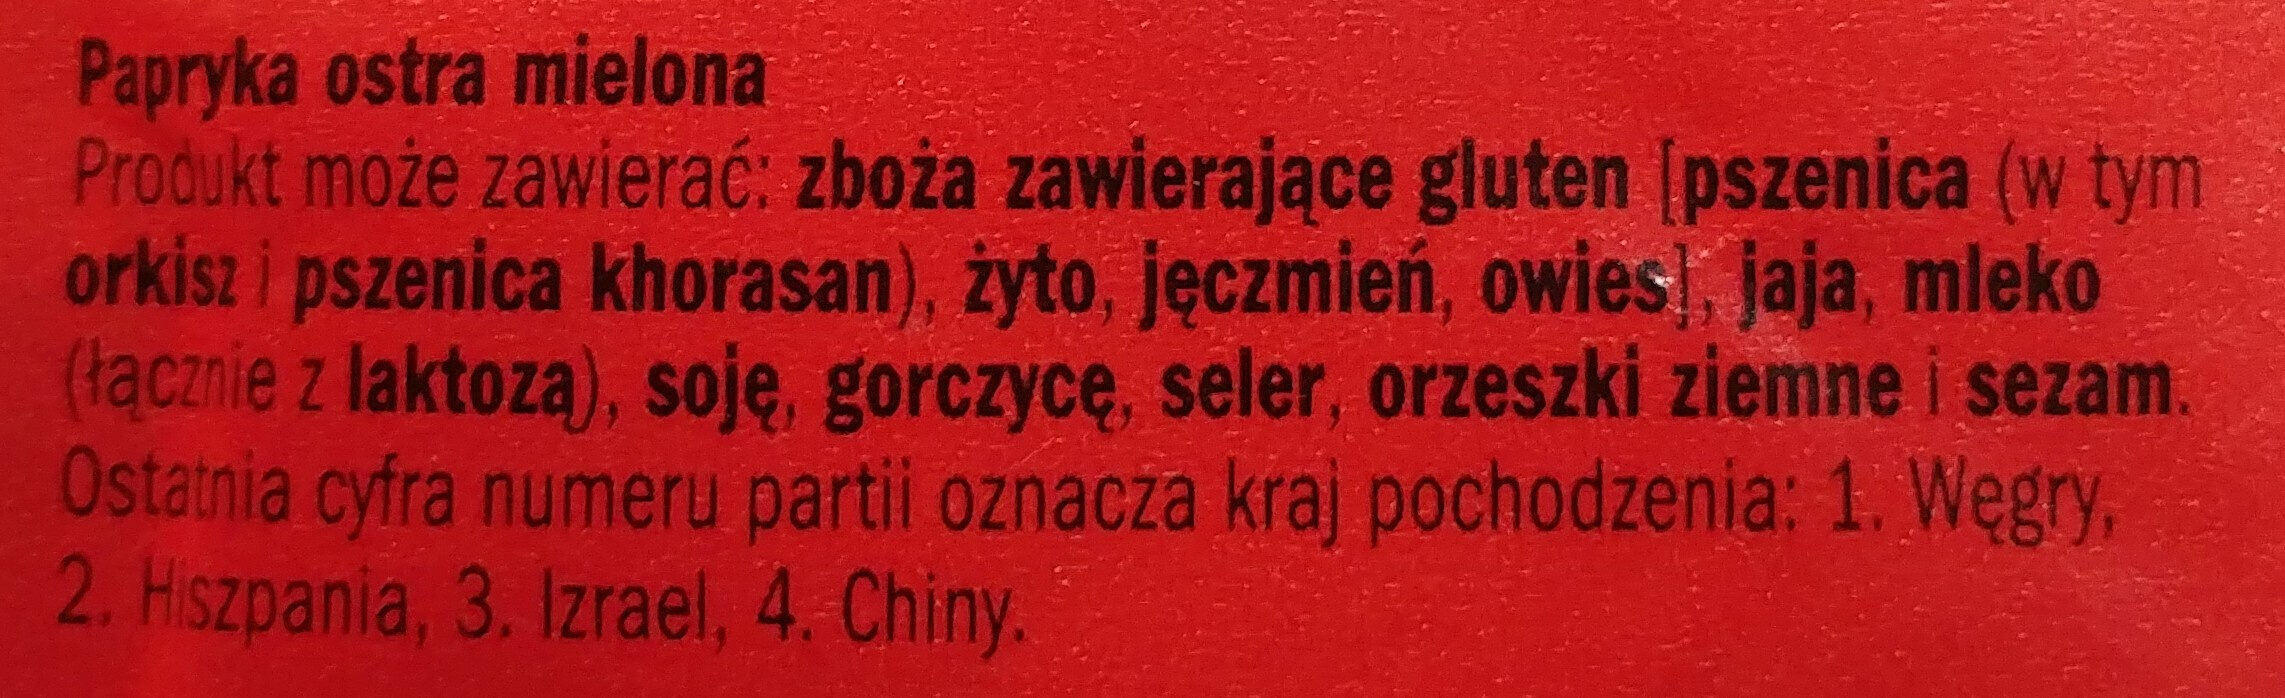 Papryka ostra mielona - Ingredients